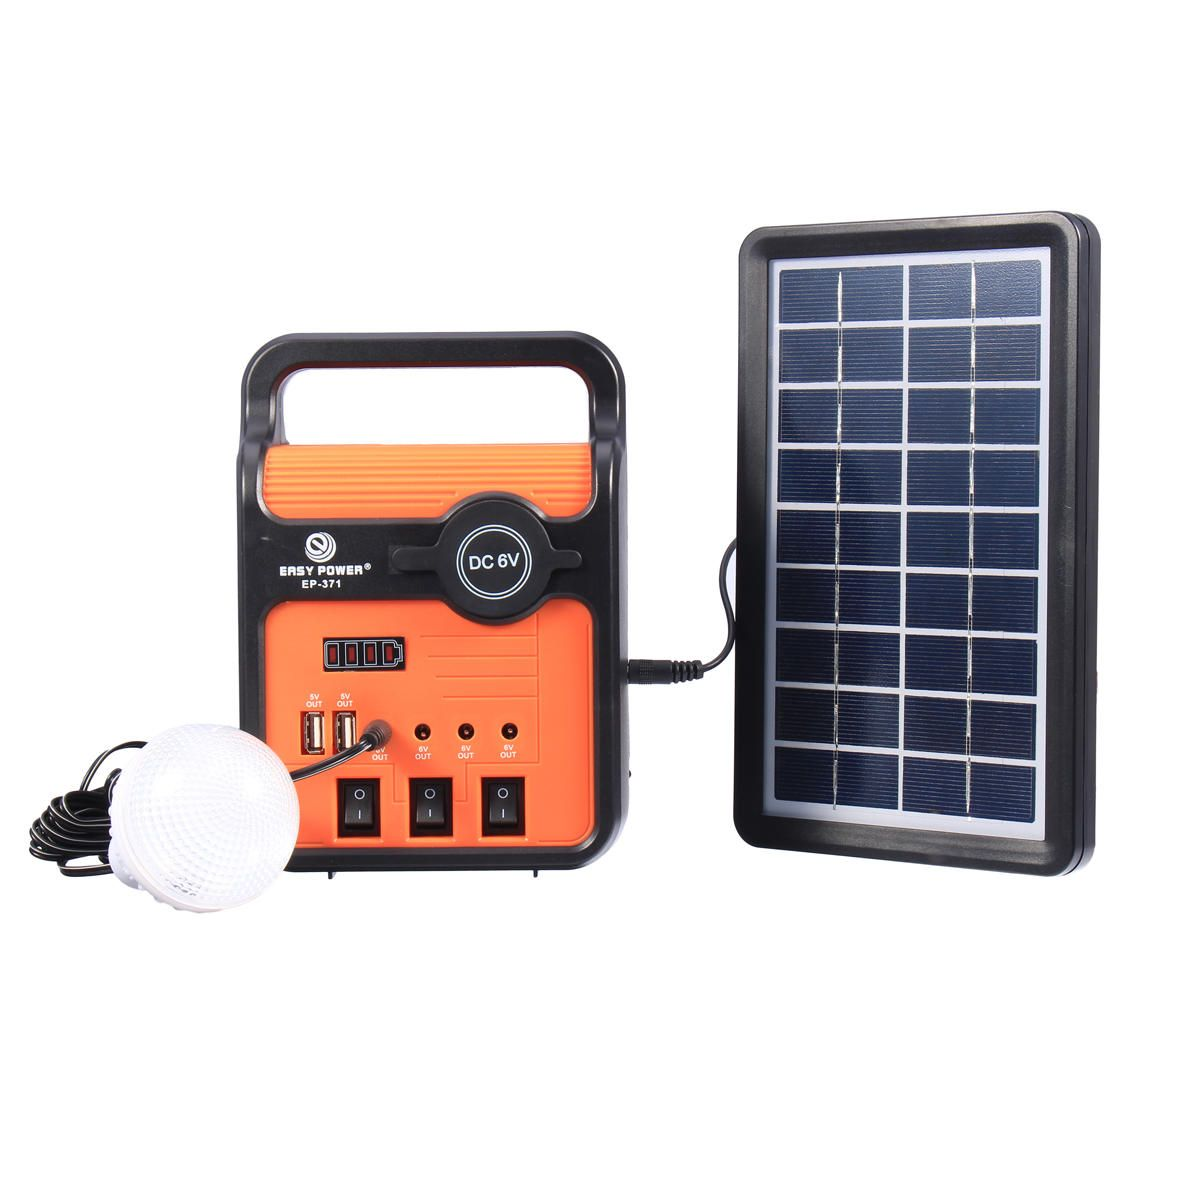 Us 64 99 25w Solar Power System Power Generator With Solar Panel Bulbs With Sock Usb Port Solar Power S Solar Power System Solar Power Panels Solar Panels